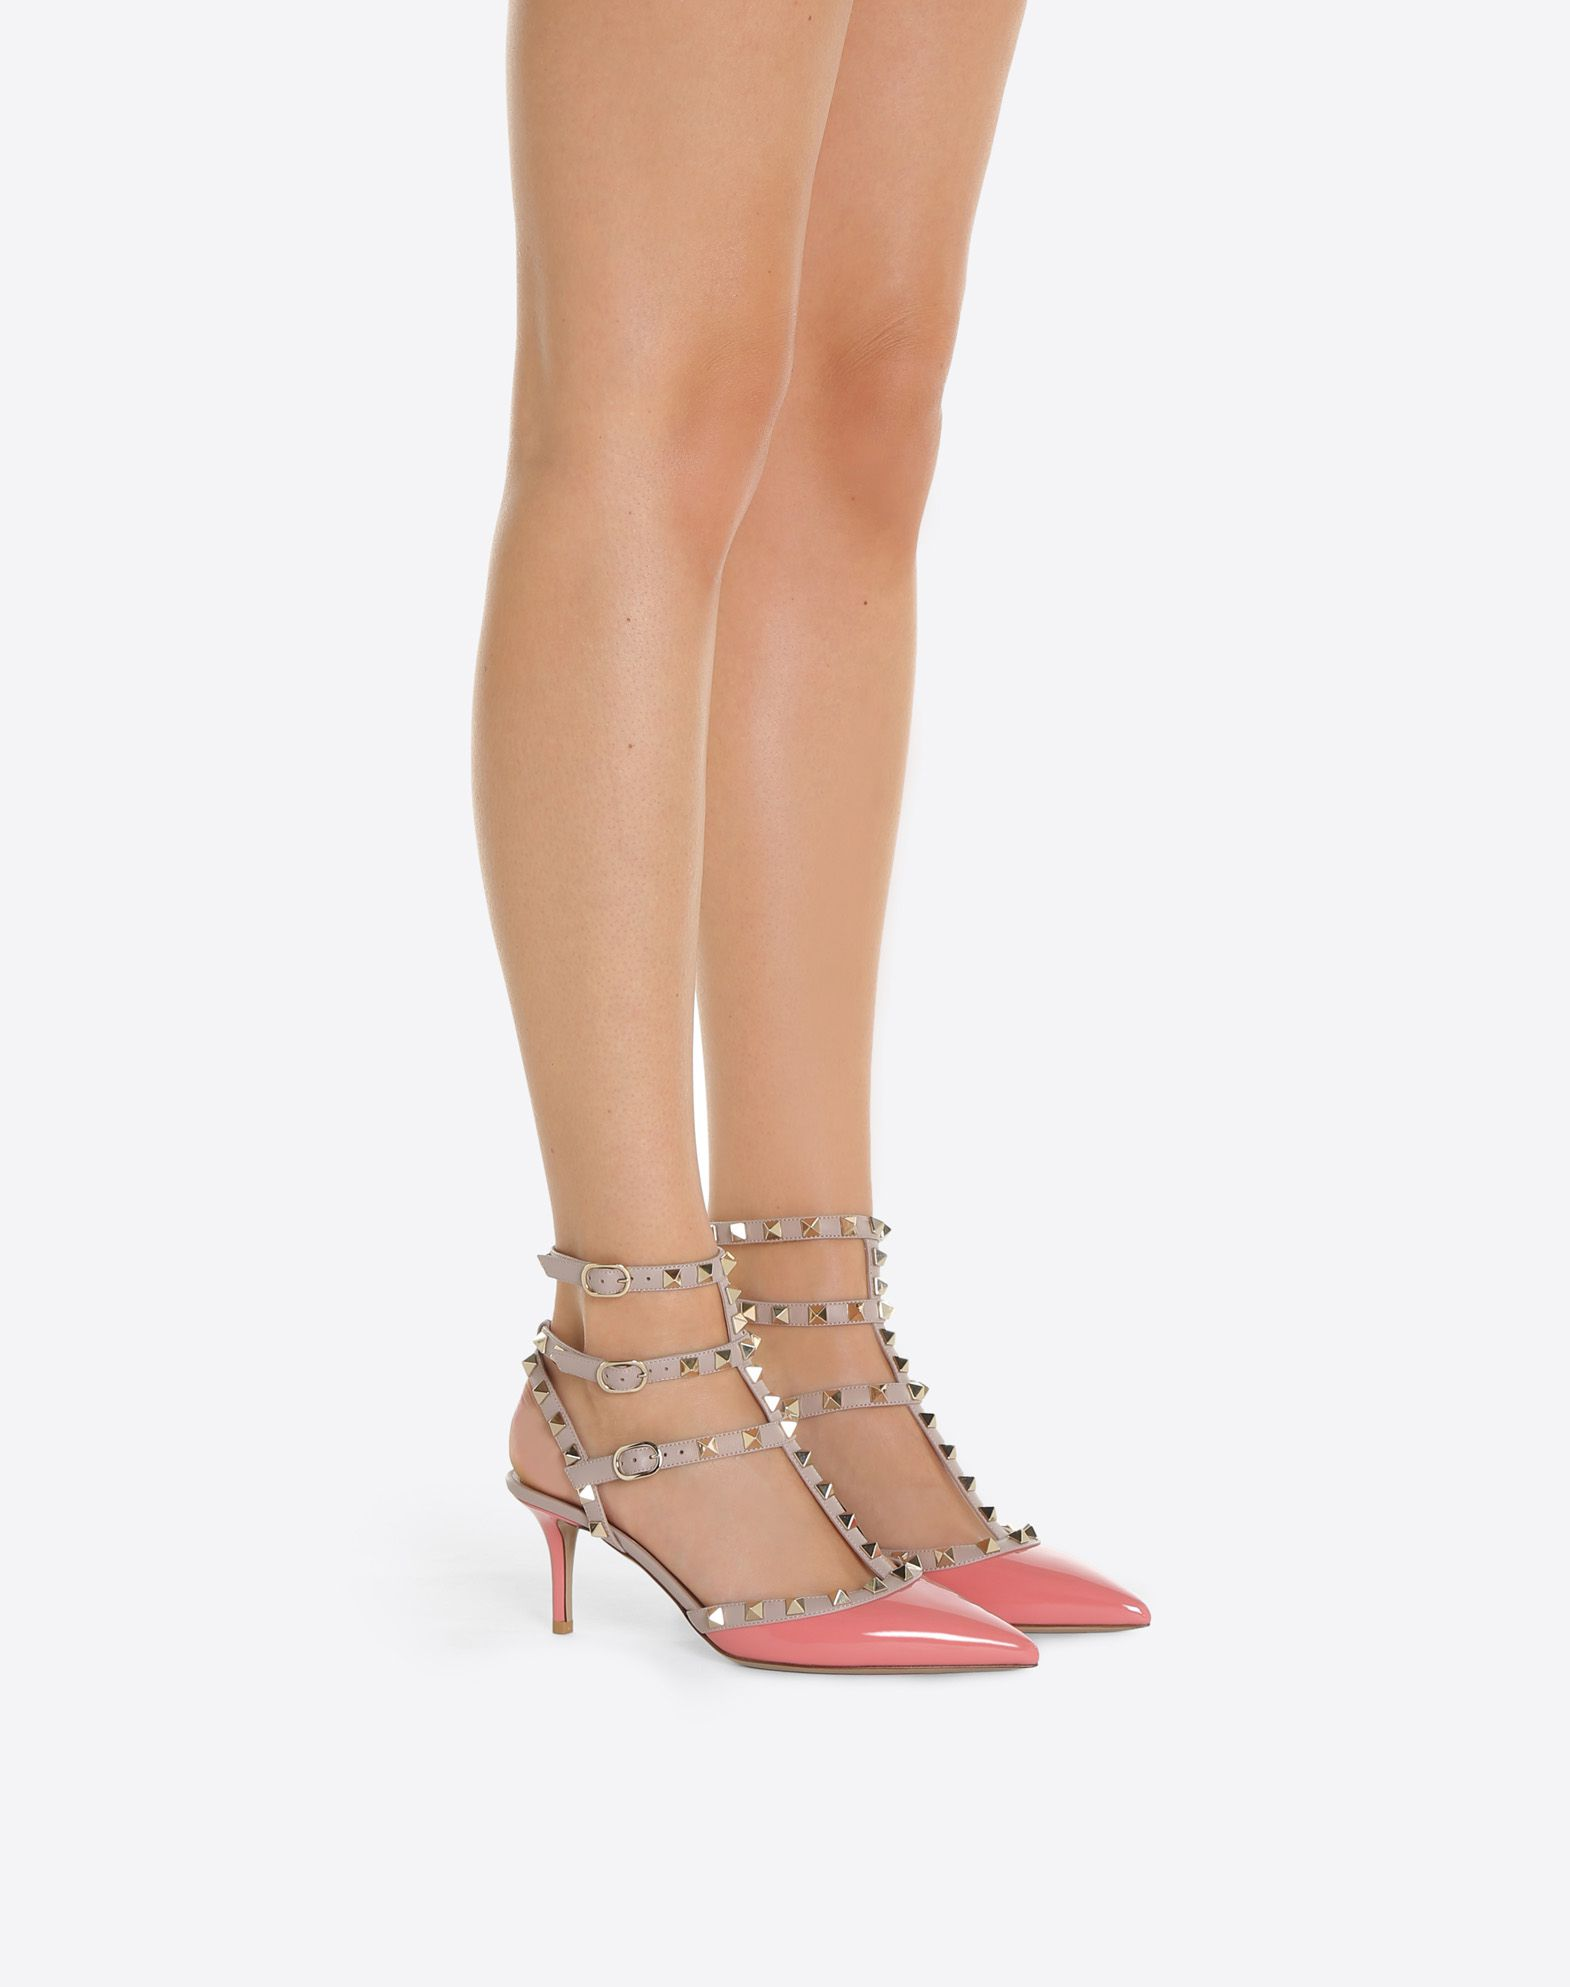 VALENTINO GARAVANI Rockstud Ankle Strap Pump MEDIUM HEEL PUMPS D a